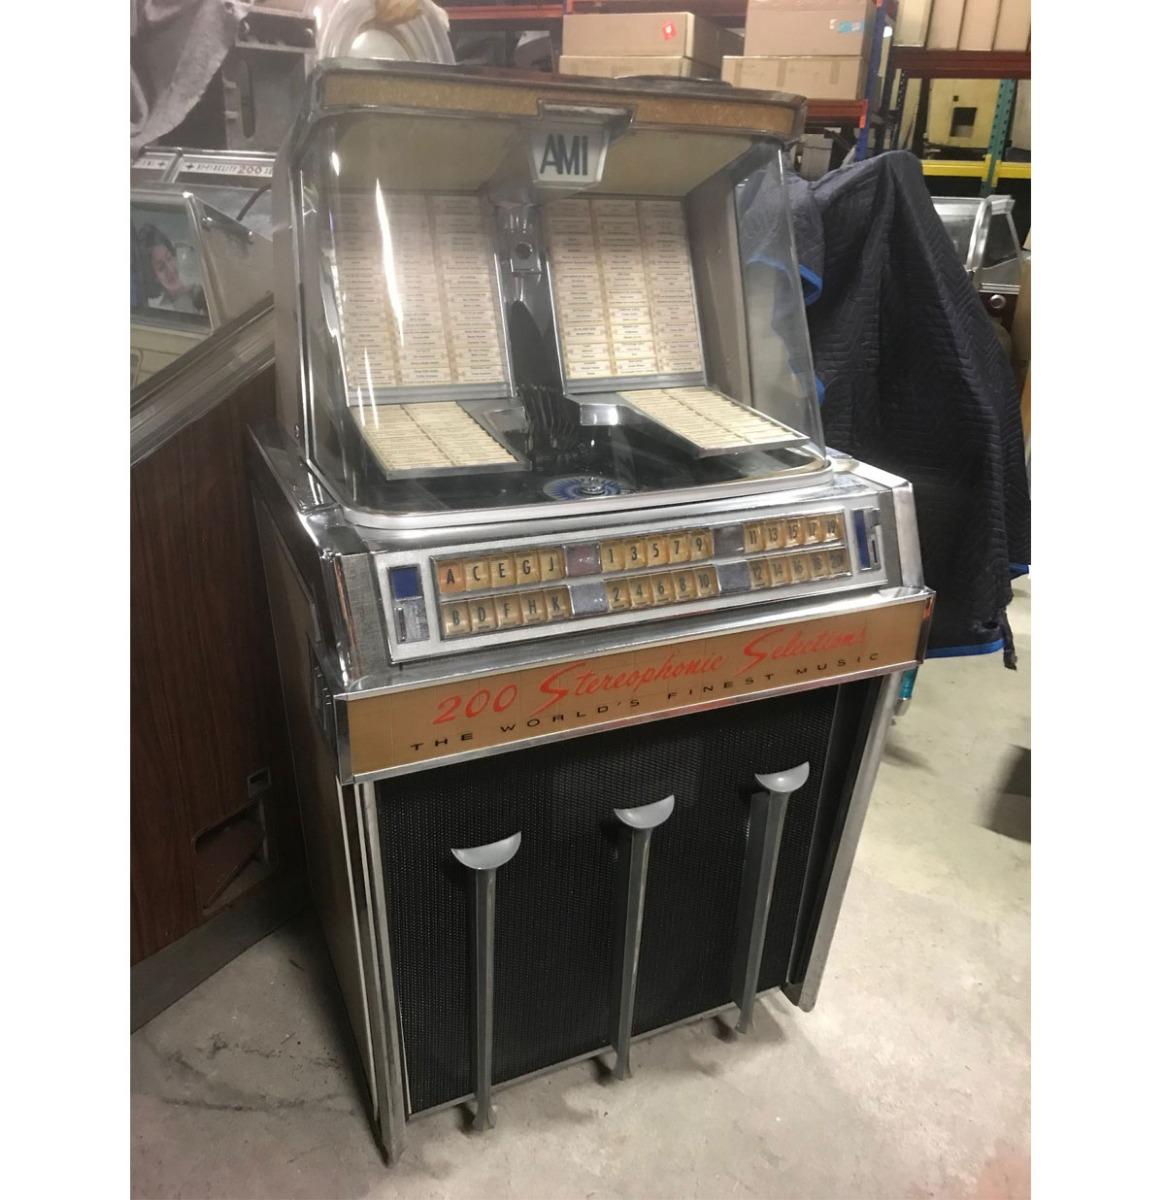 AMI K Jukebox - 1960 - 200 Selecties - Origineel